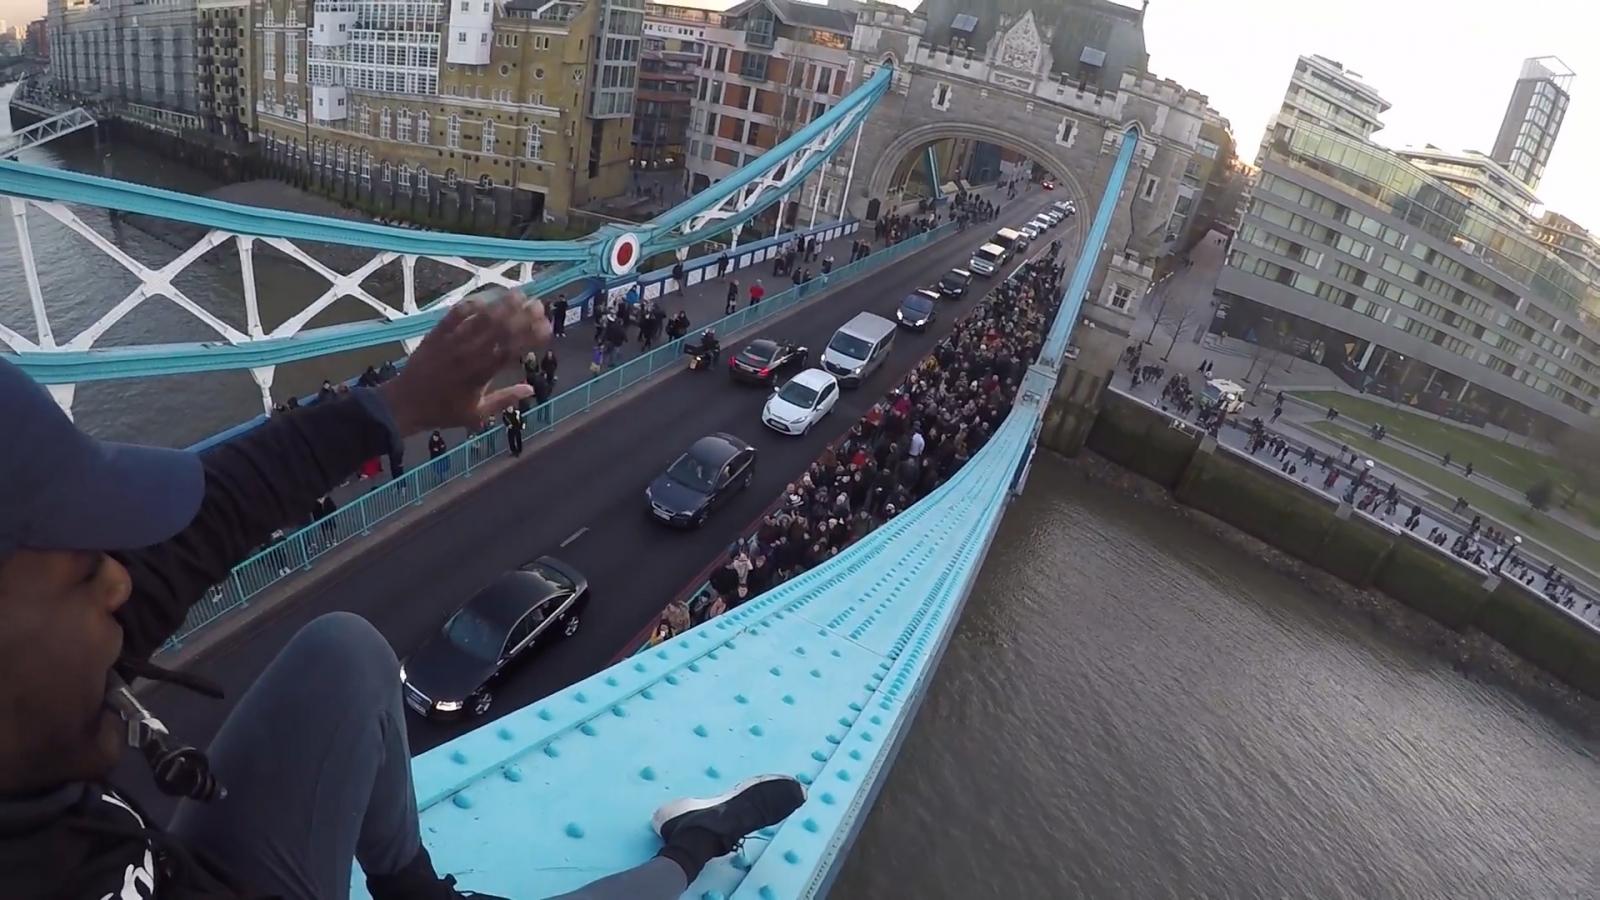 'Urban explorer' climbs Tower Bridge with no harness